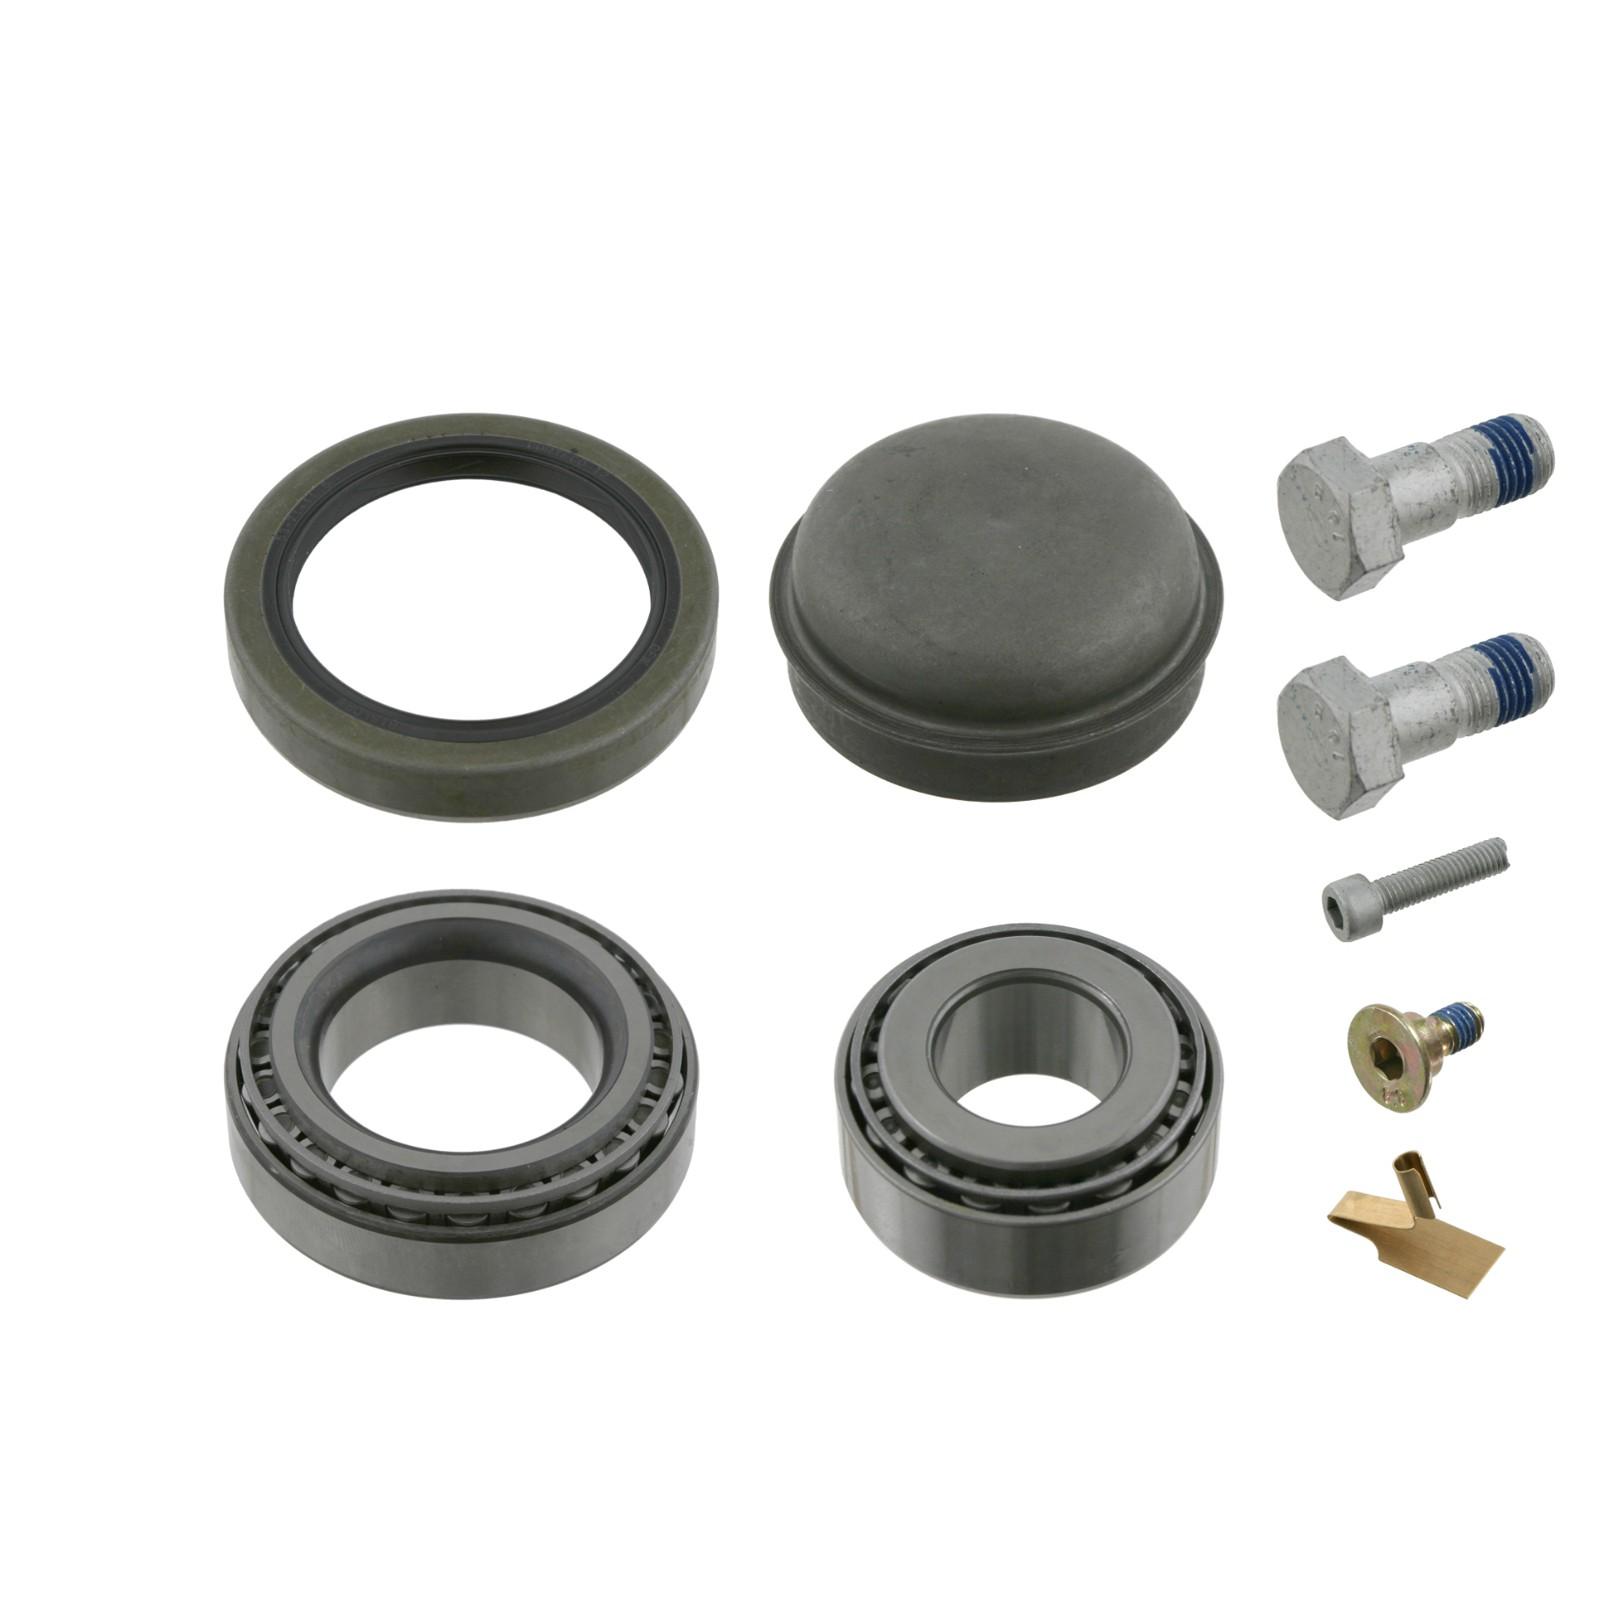 FEBI 05416 Radlagersatz Radlager MERCEDES W140 S280-600 S300/350 Turbo-D vorne A1403300251